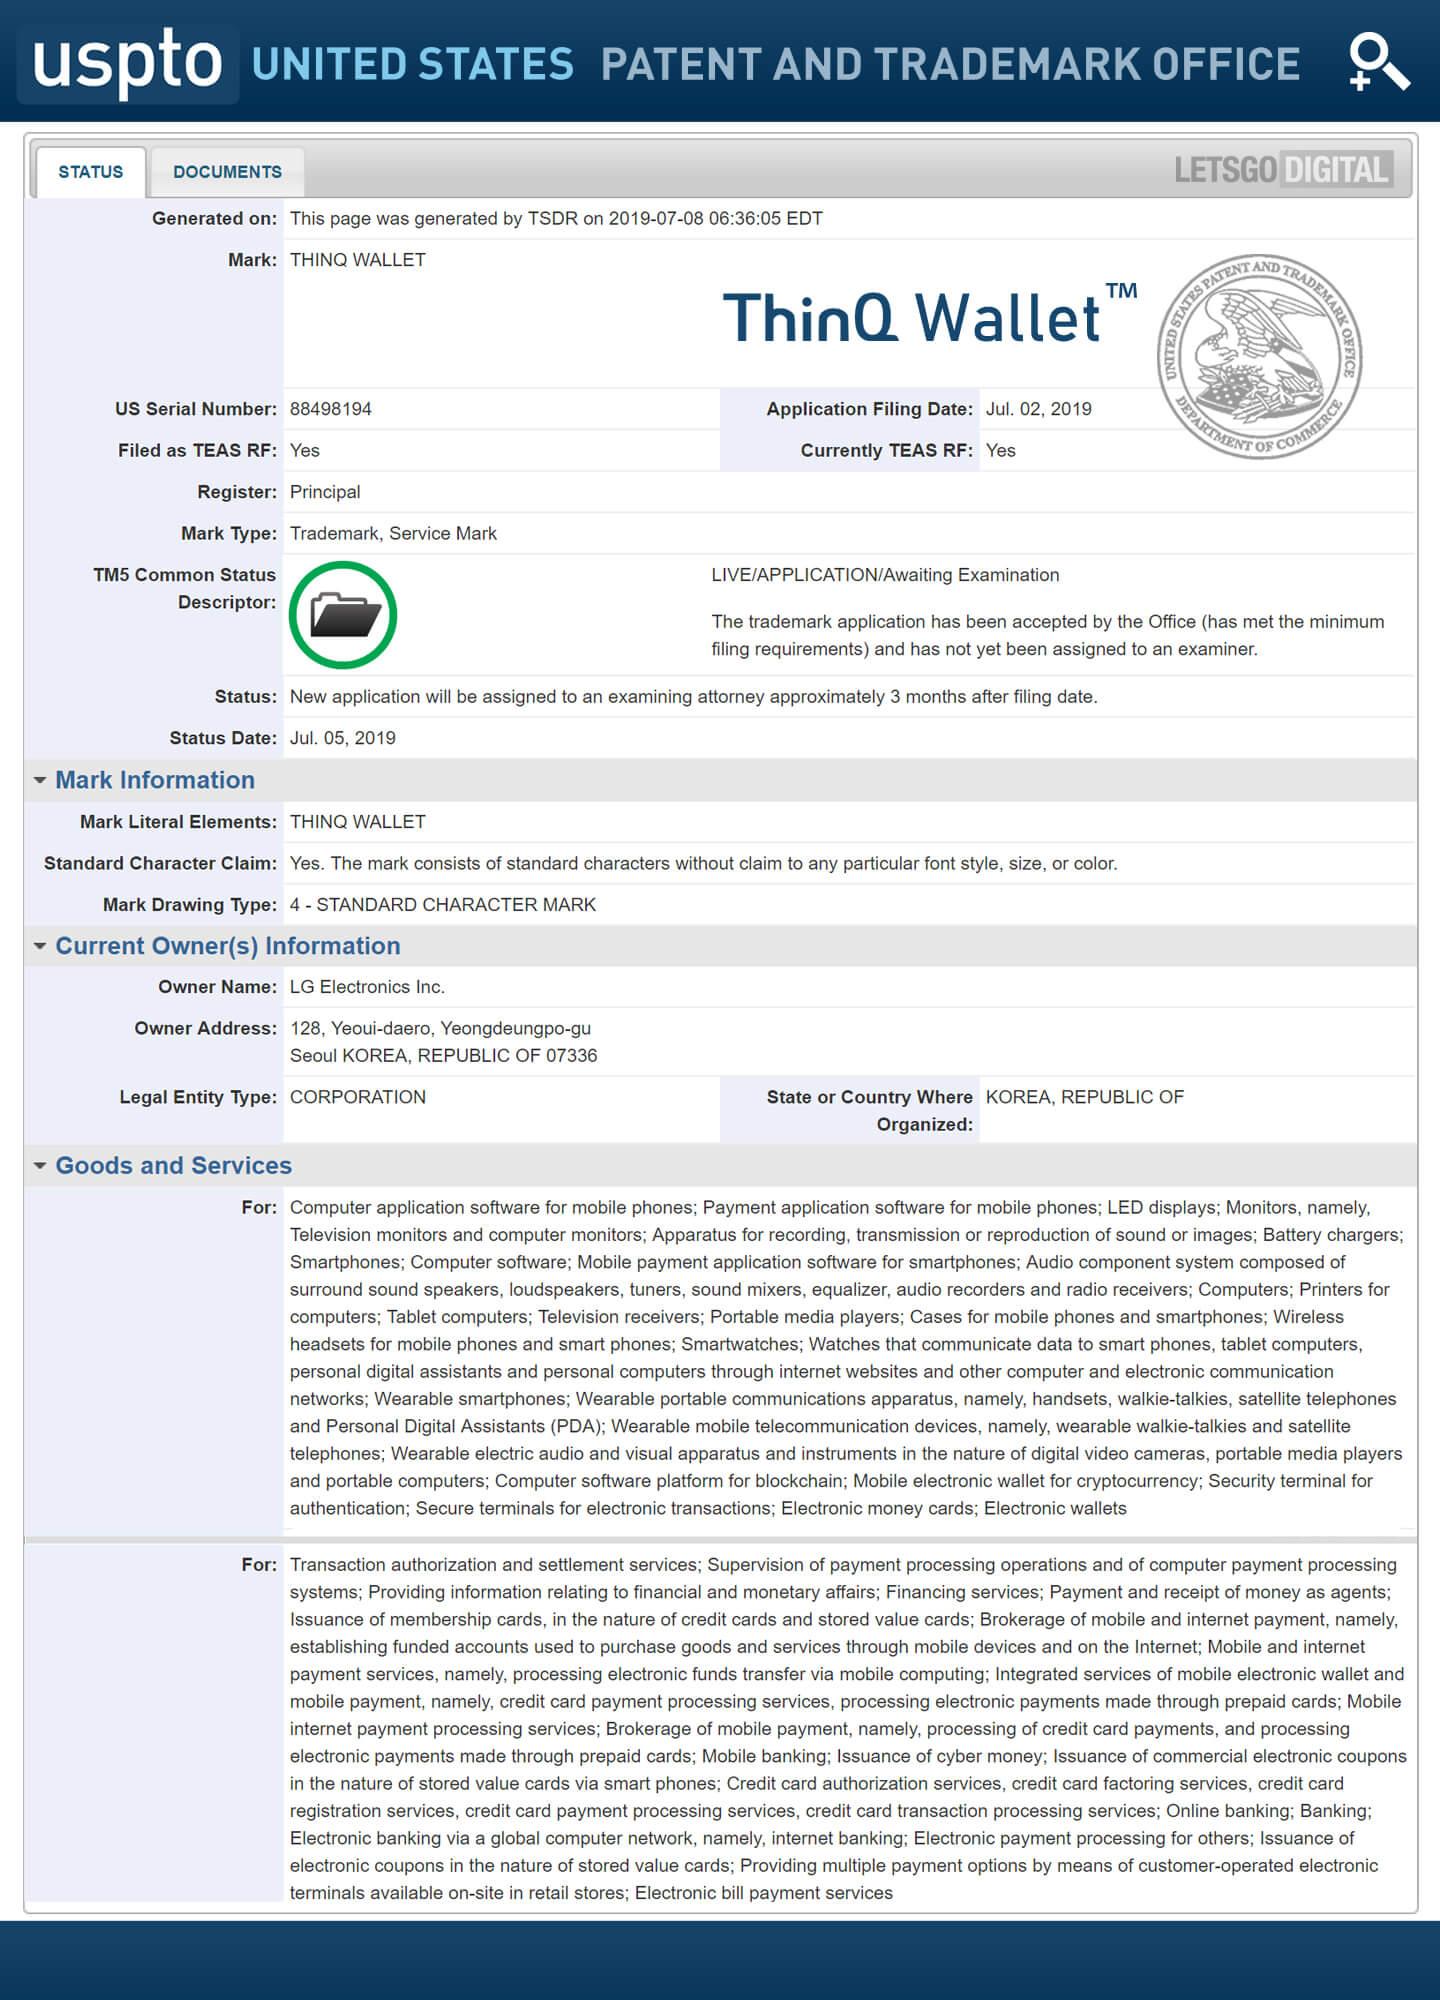 LG ThinQ Wallet